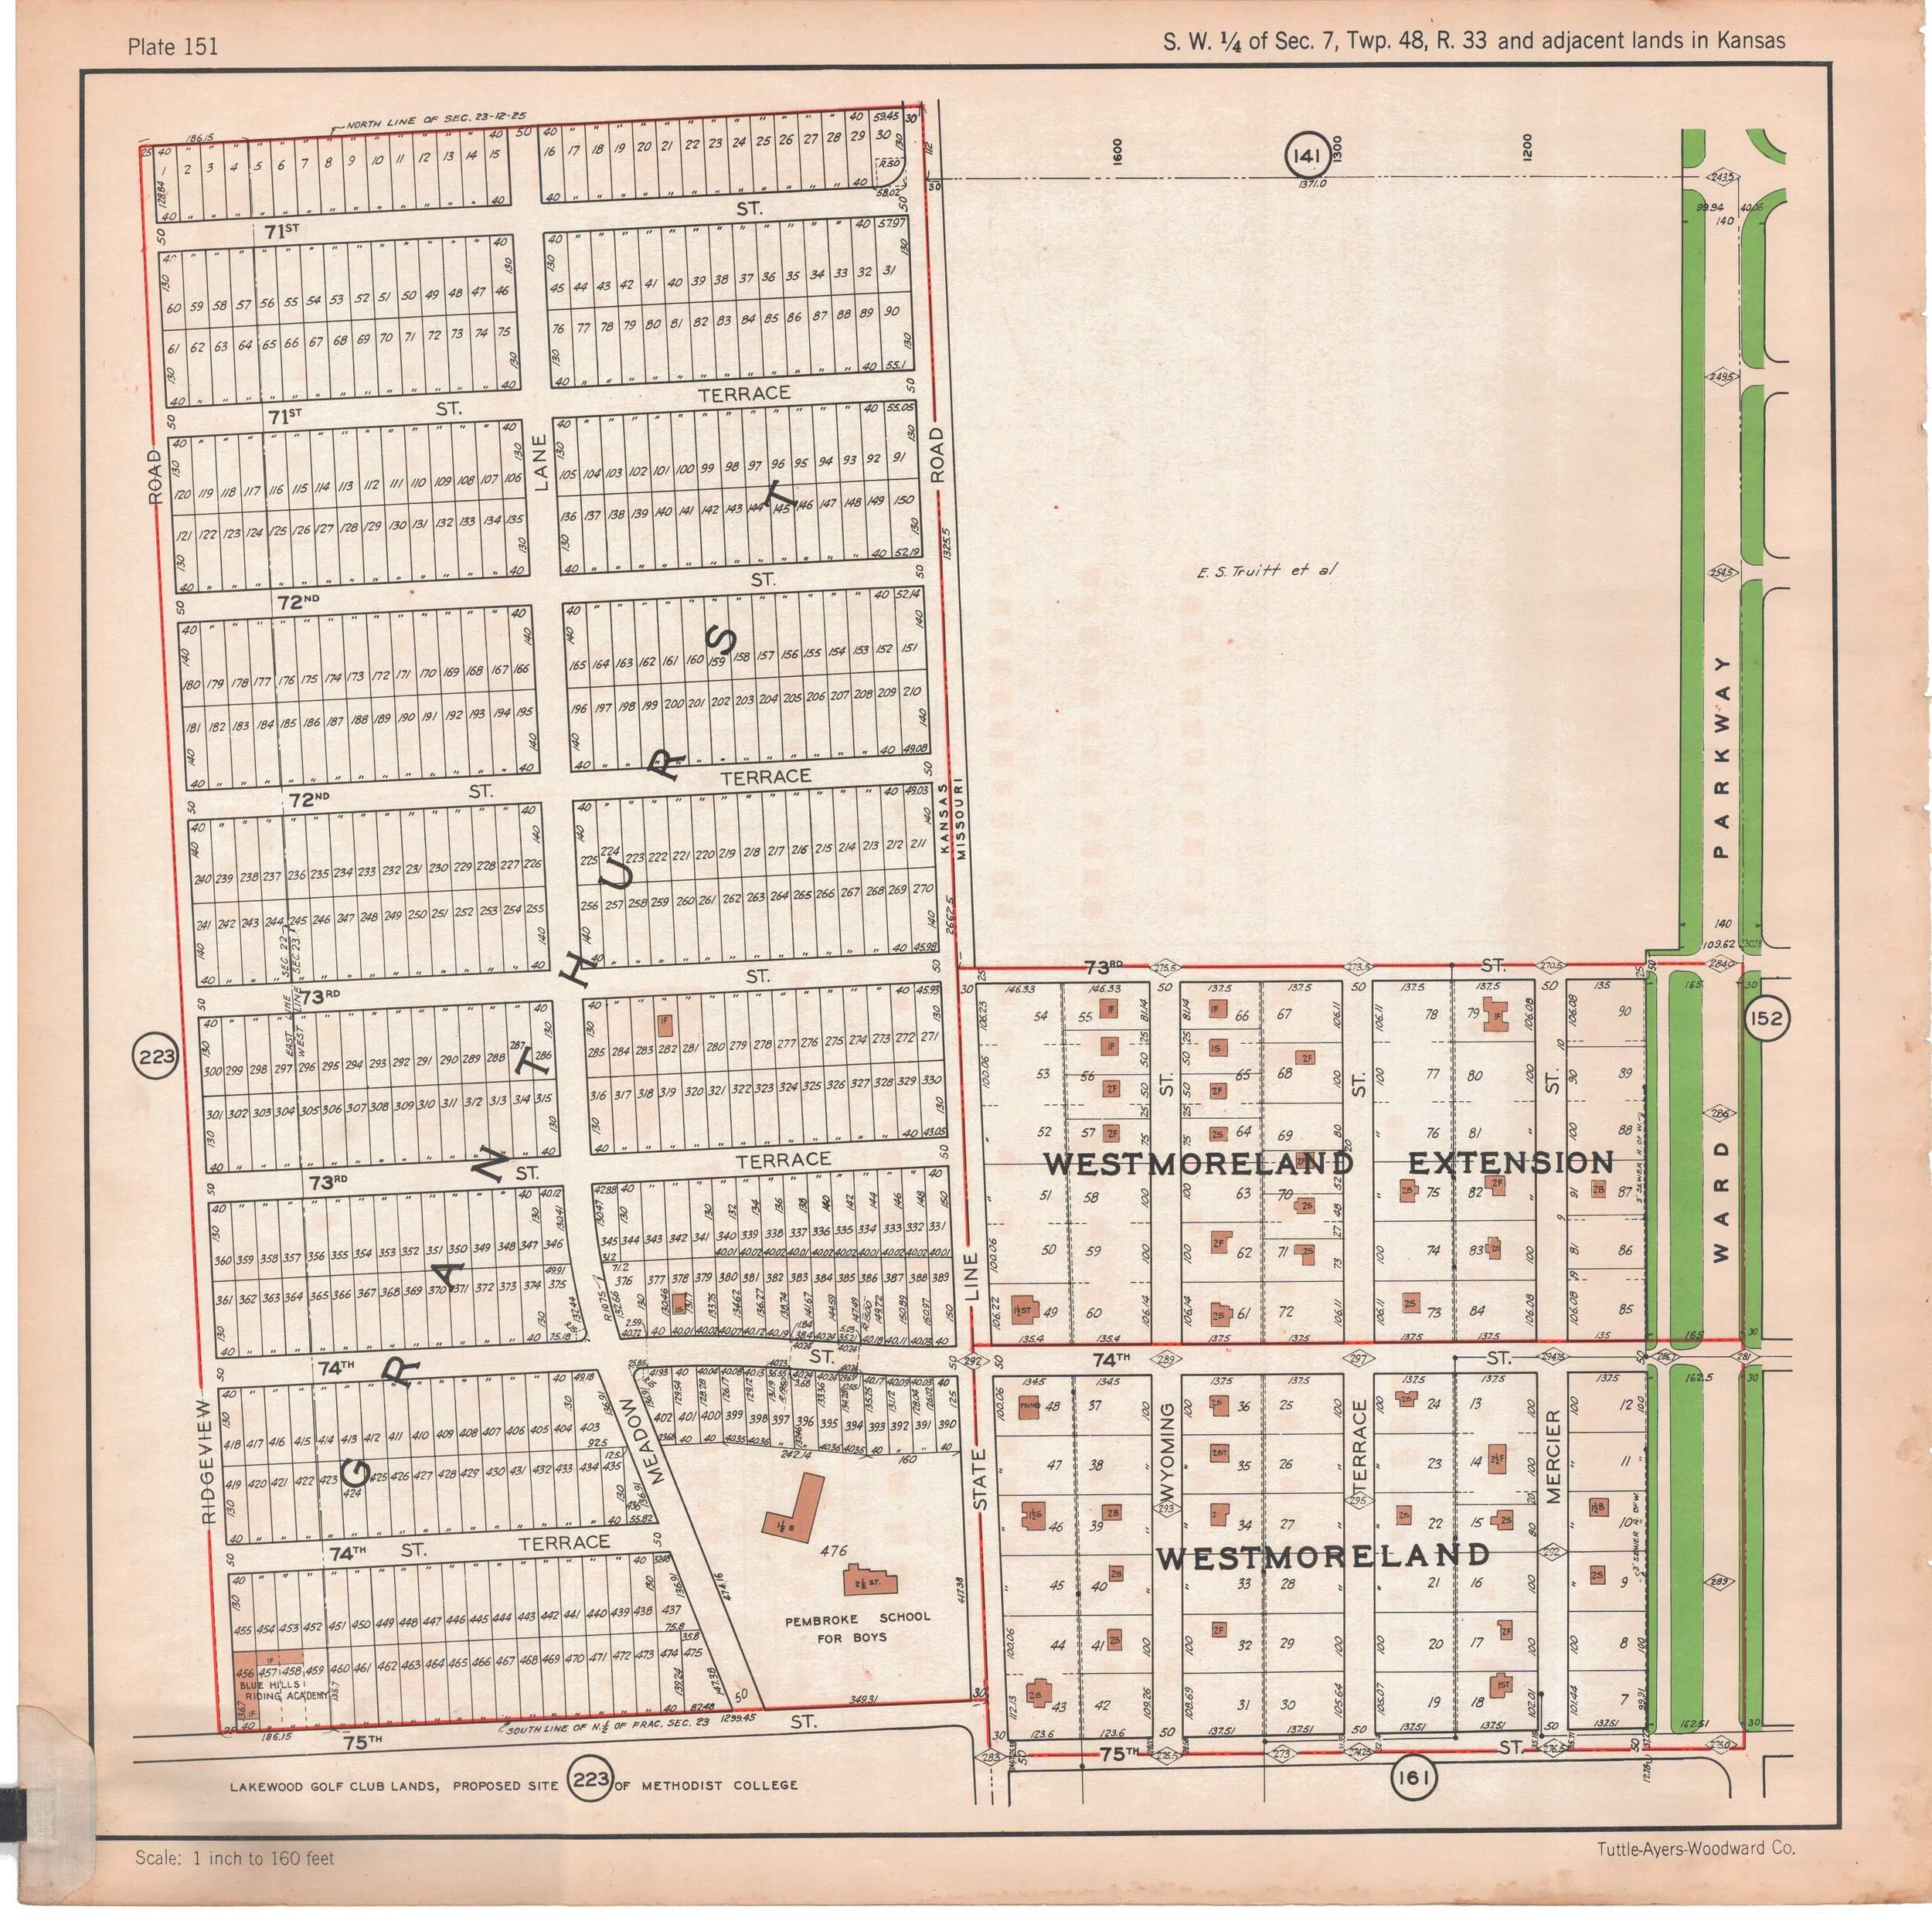 1925 TUTTLE_AYERS_Plate_151.JPG